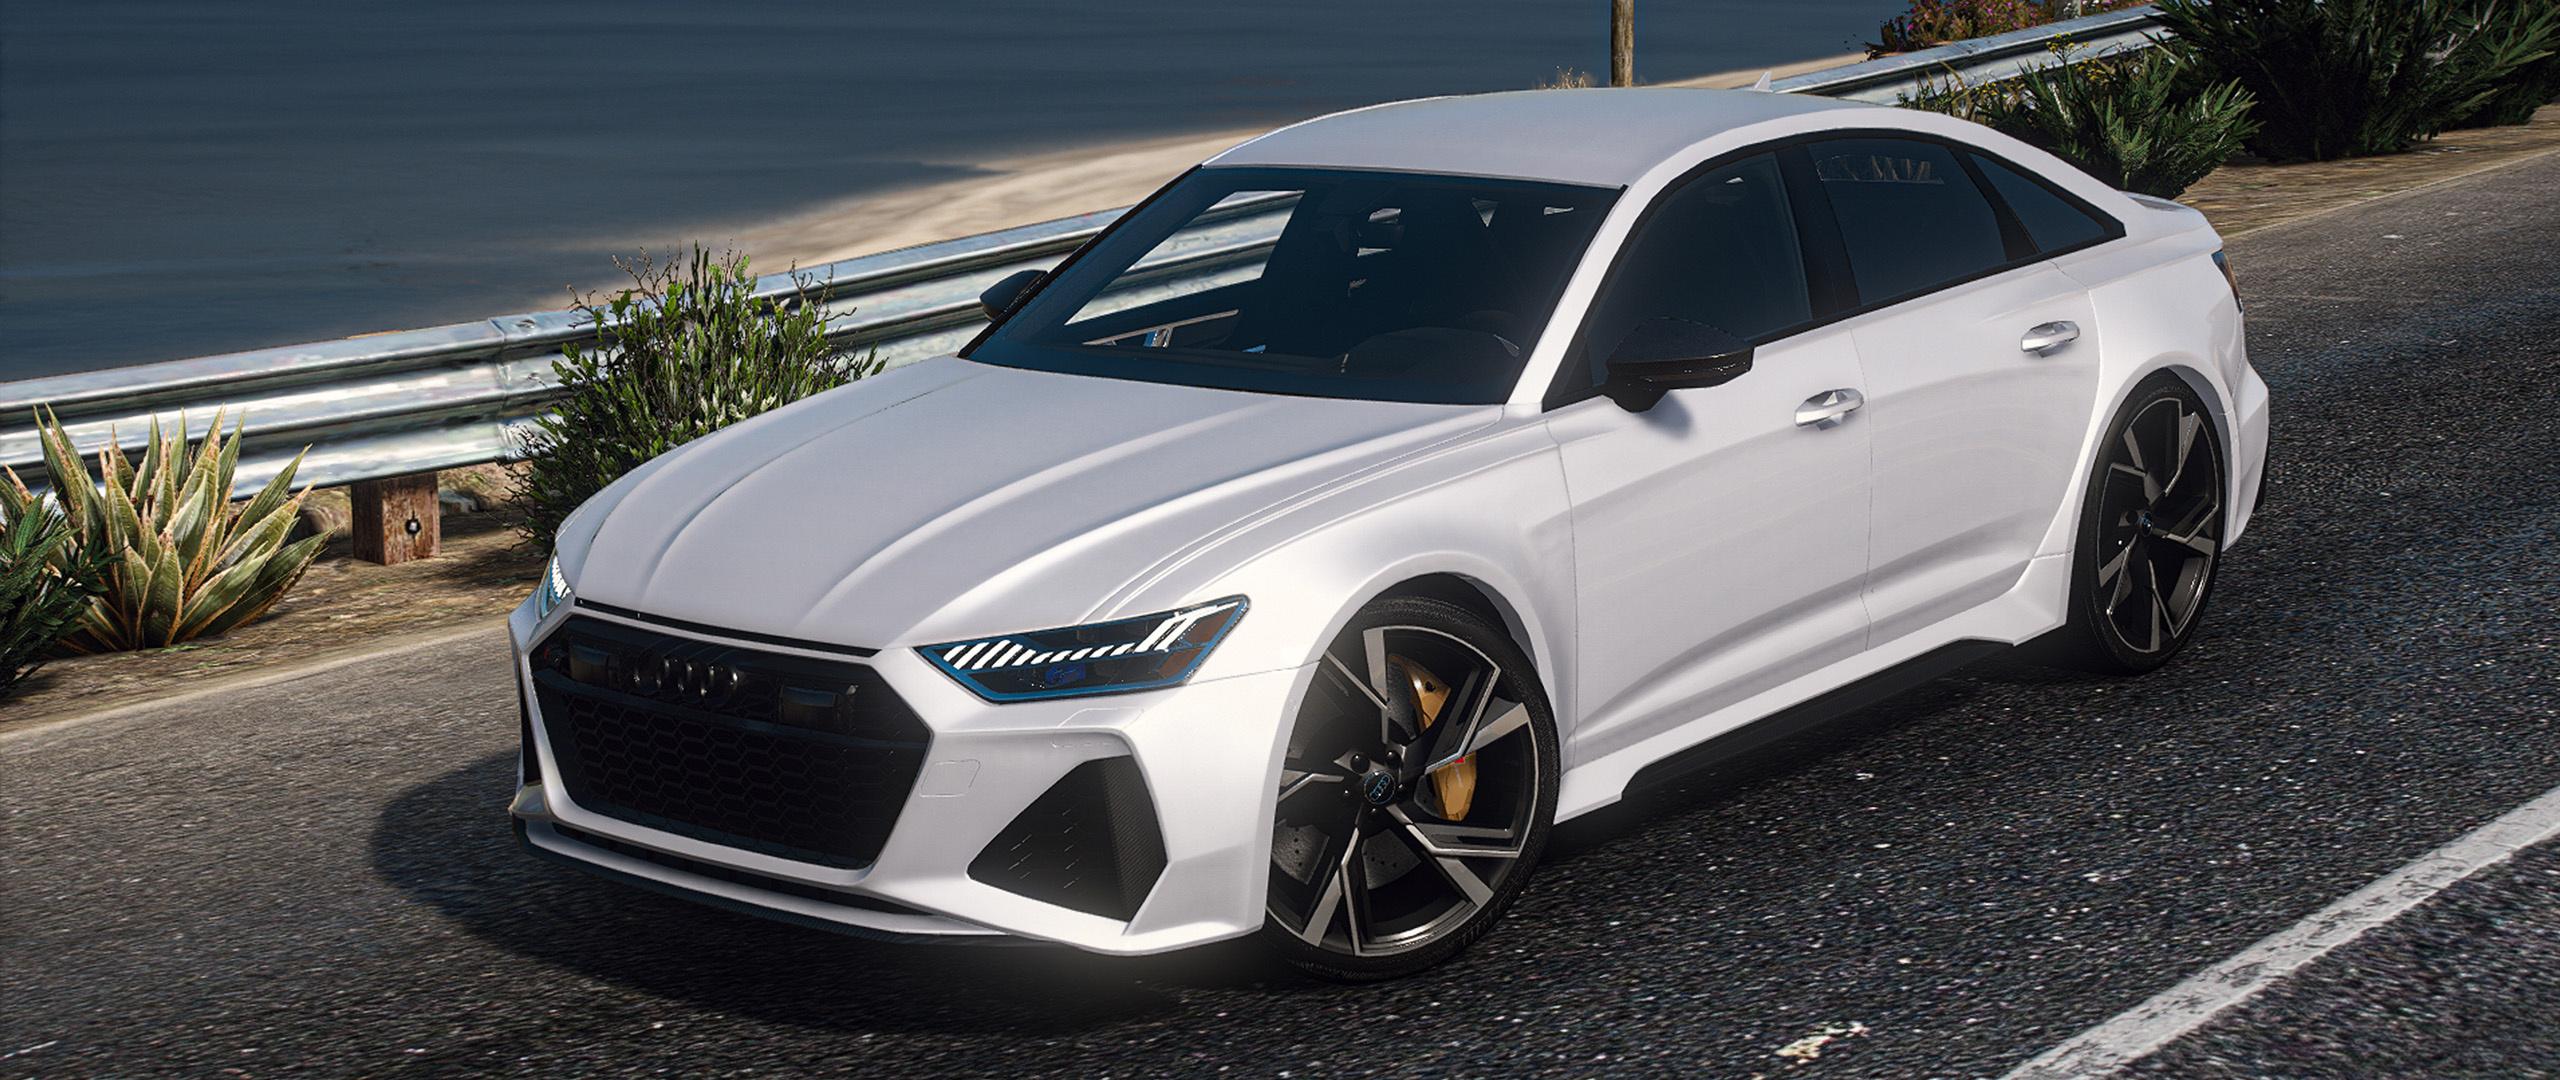 2021 Audi RS6 Sedan (C8) Add-On 1.0 - GTA5mod.net